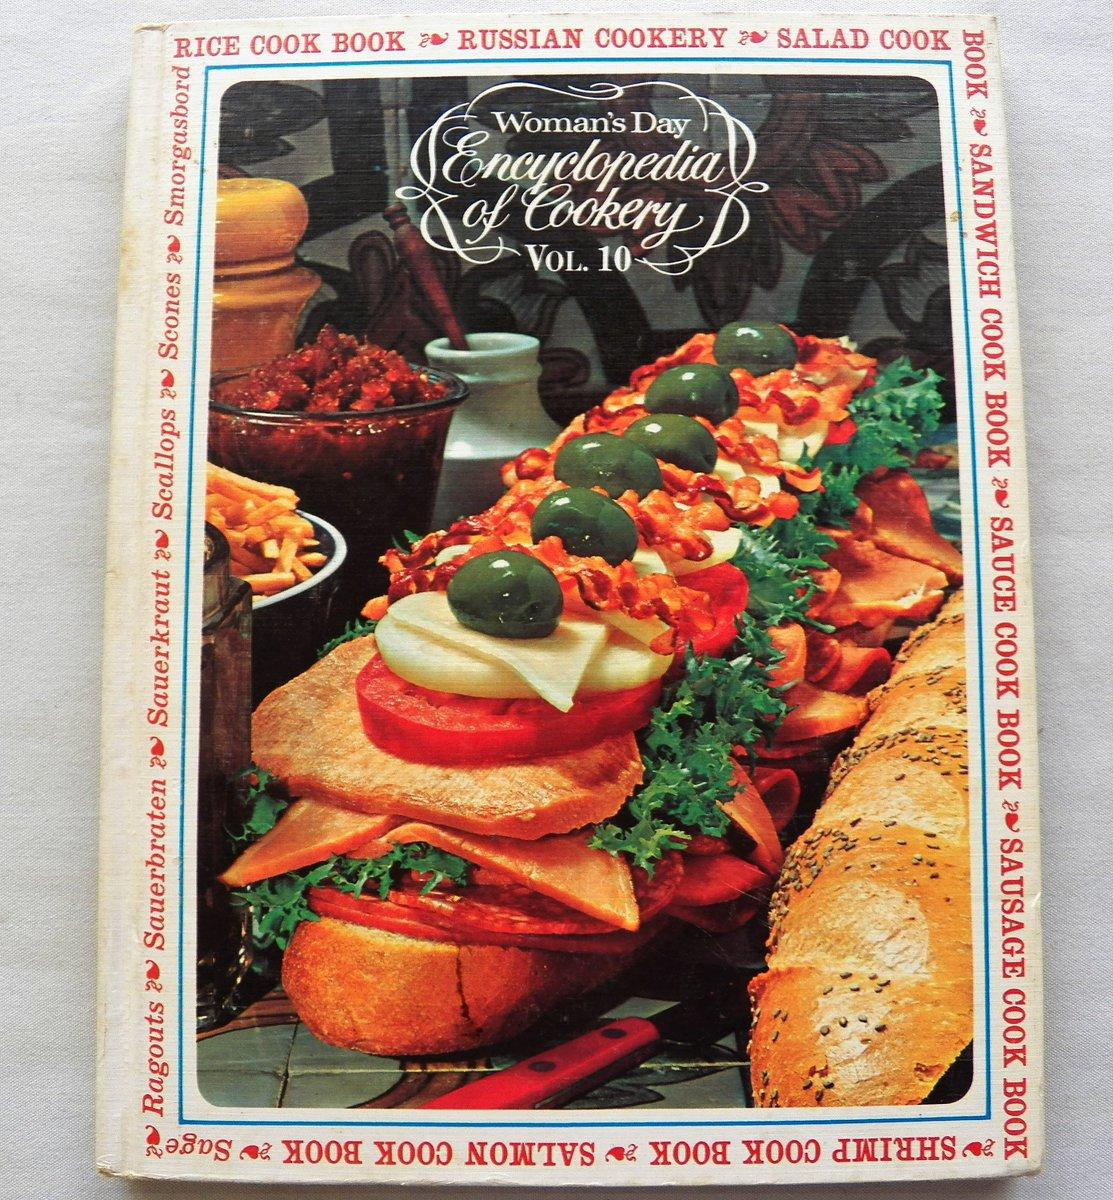 Woman&#39;s Day Encyclopedia Vol. 10 1966 HC #vintagecookbooks #WomansDay #cookbooks #cookbookstores #books #bookstores #usedbooks #BookResque  https://www. ebay.com/itm/Womans-Day -Encyclopedia-Vol-10-1966-HC-cookbooks/323350769584?hash=item4b49352fb0:g:RtAAAOSwJTta2KQp &nbsp; … <br>http://pic.twitter.com/m20AEOKYK5